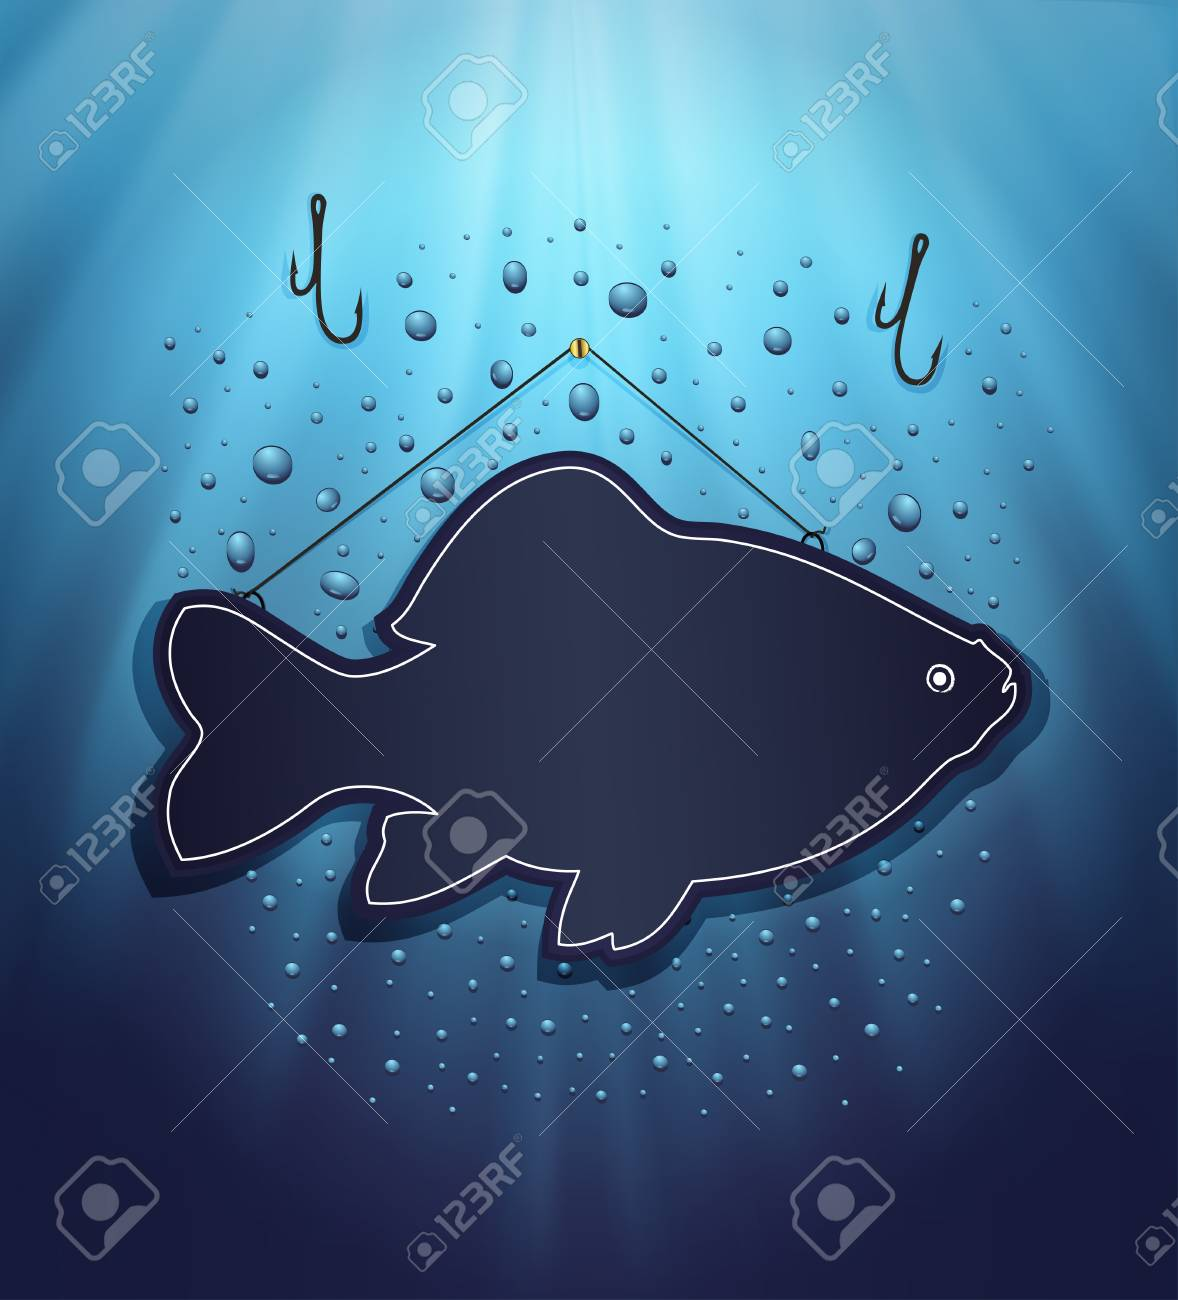 raster blackboard fish water blue background drops Stock Photo - 13166292